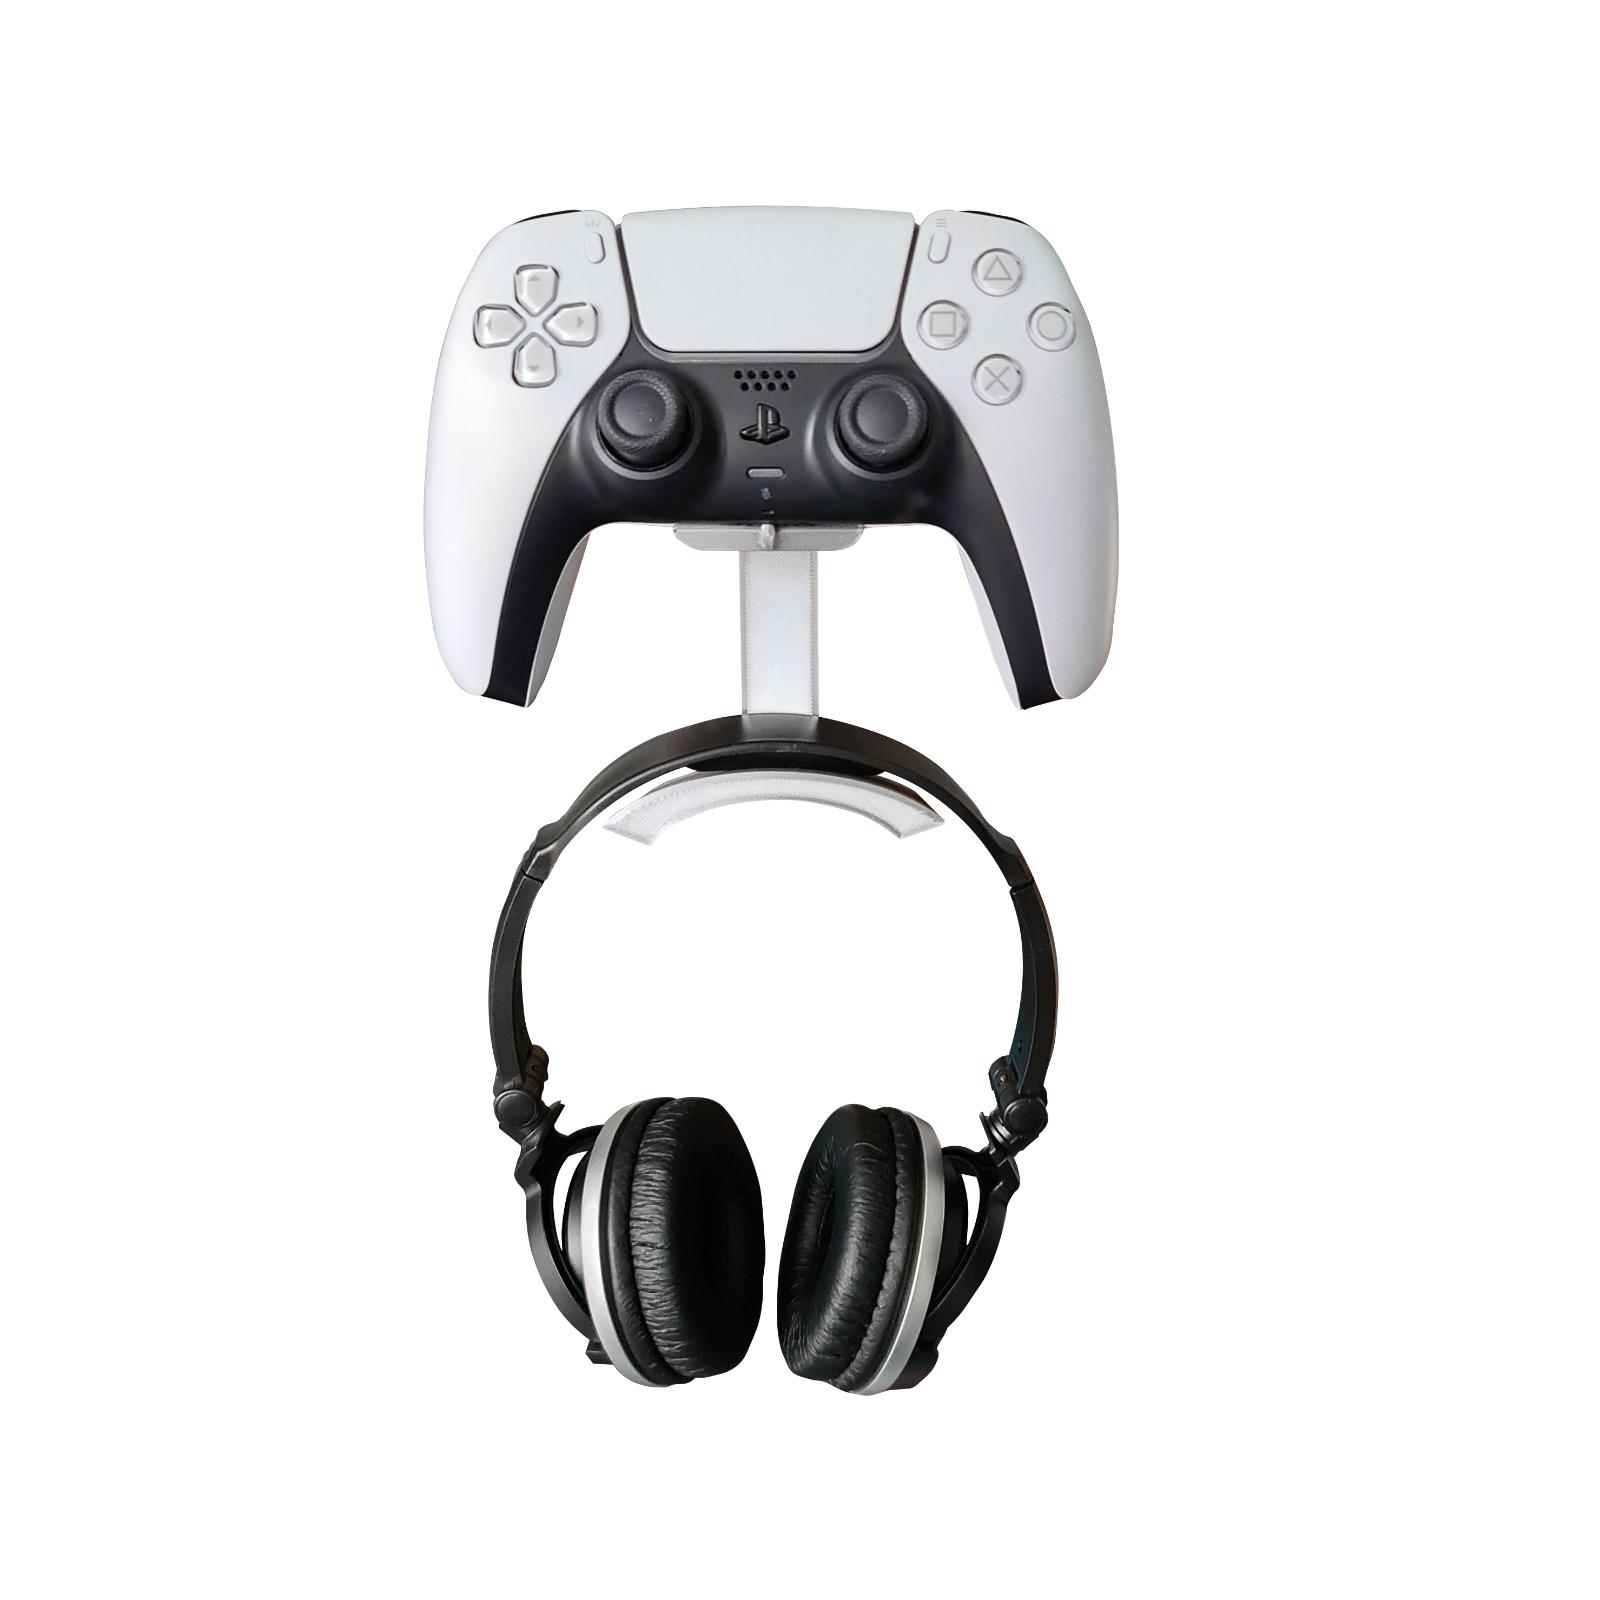 Playstation 5 Headphones & Controller Wall Mount